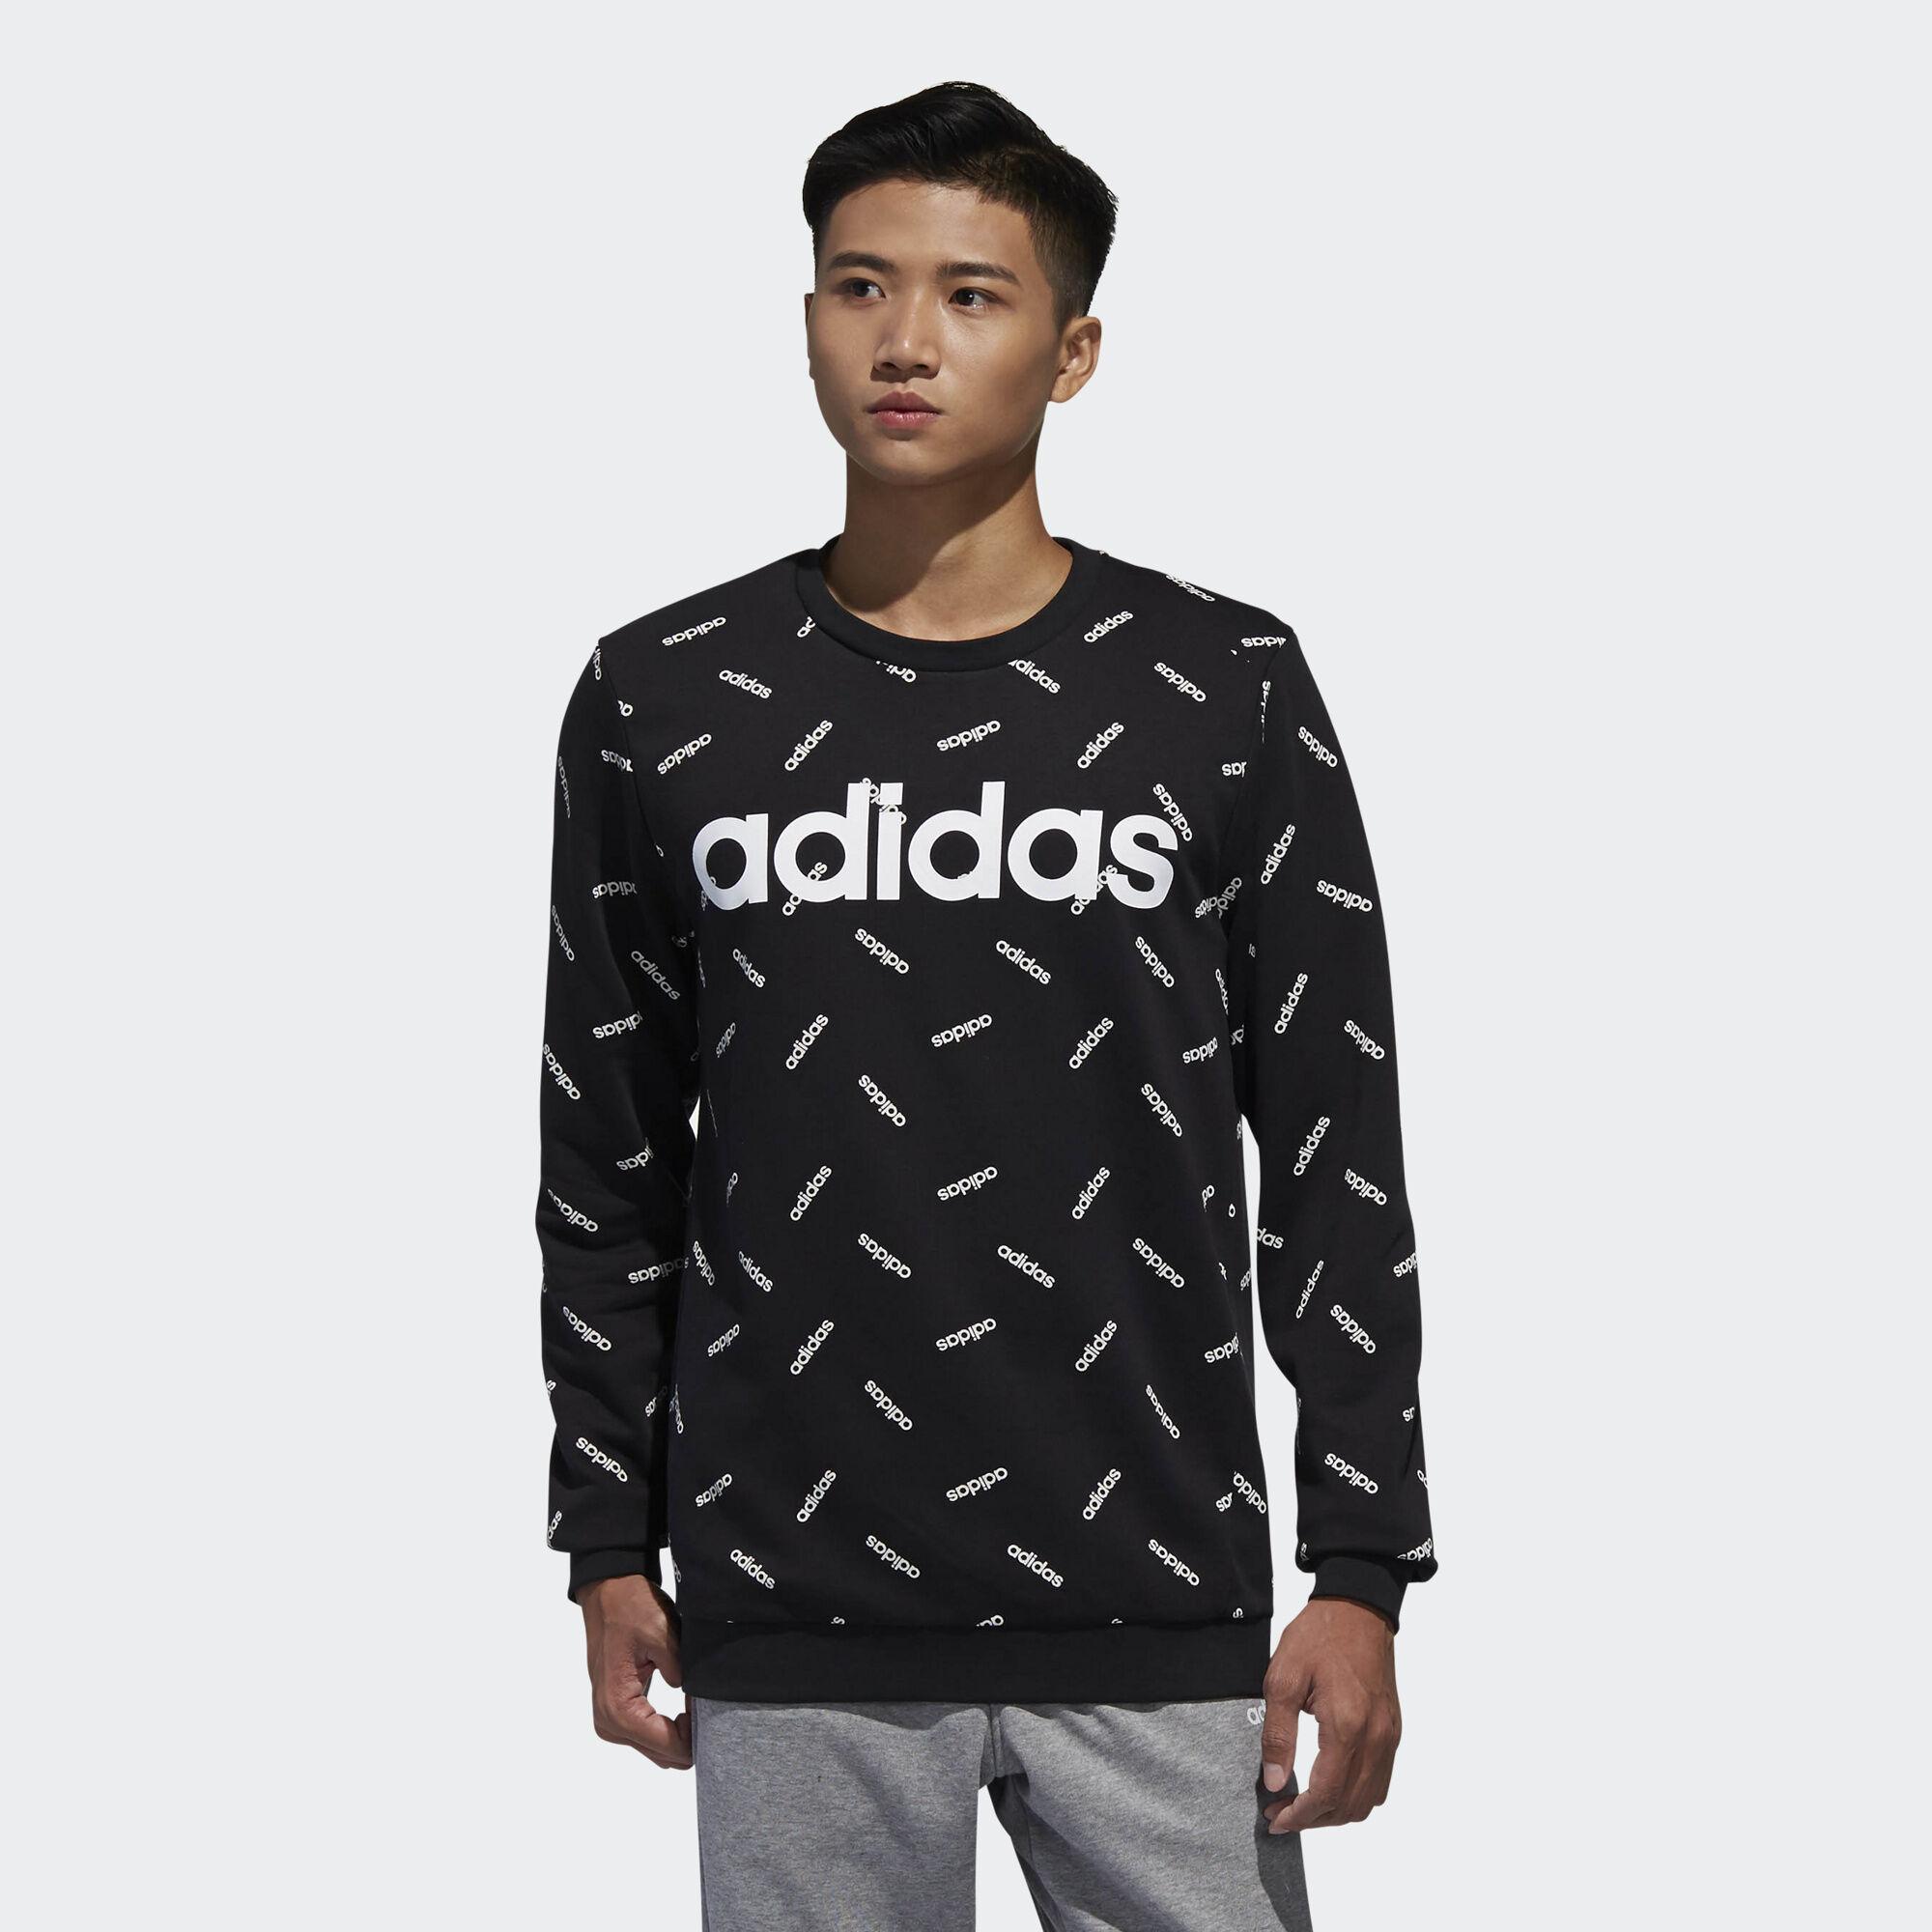 adidas Graphic Sweatshirt Black | adidas Vietnam